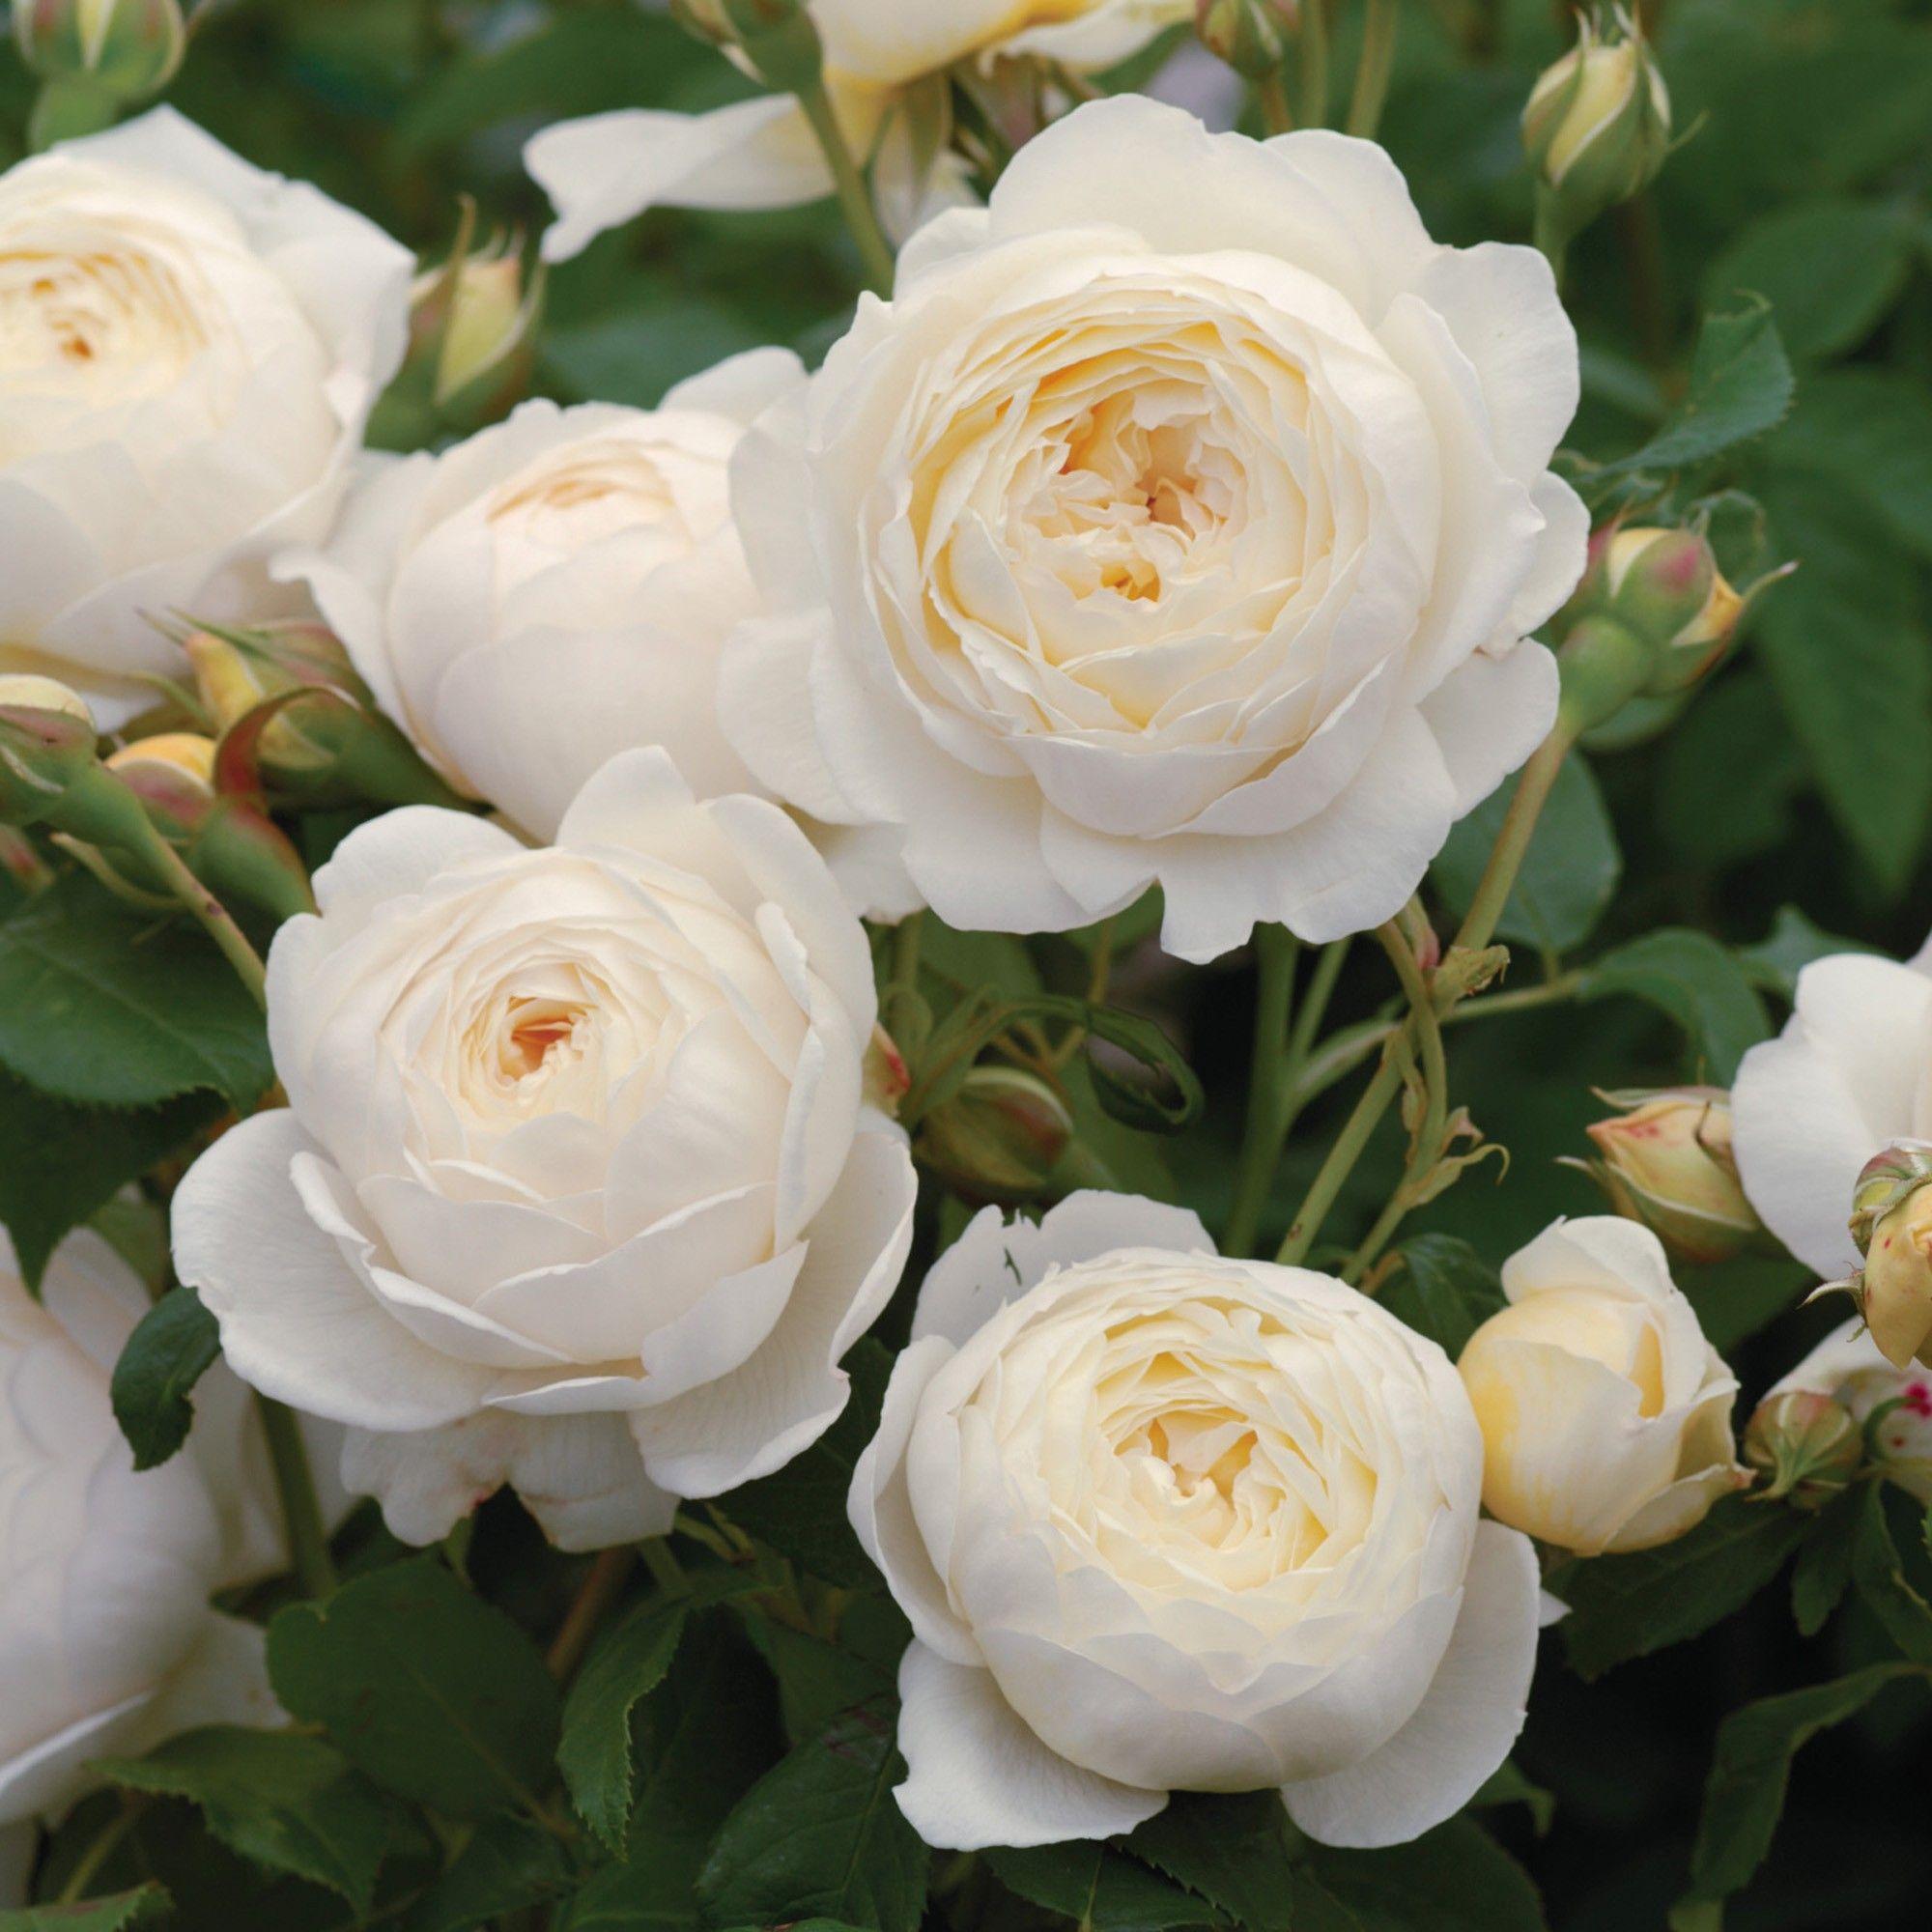 Resultado de imagen de rose claire austin